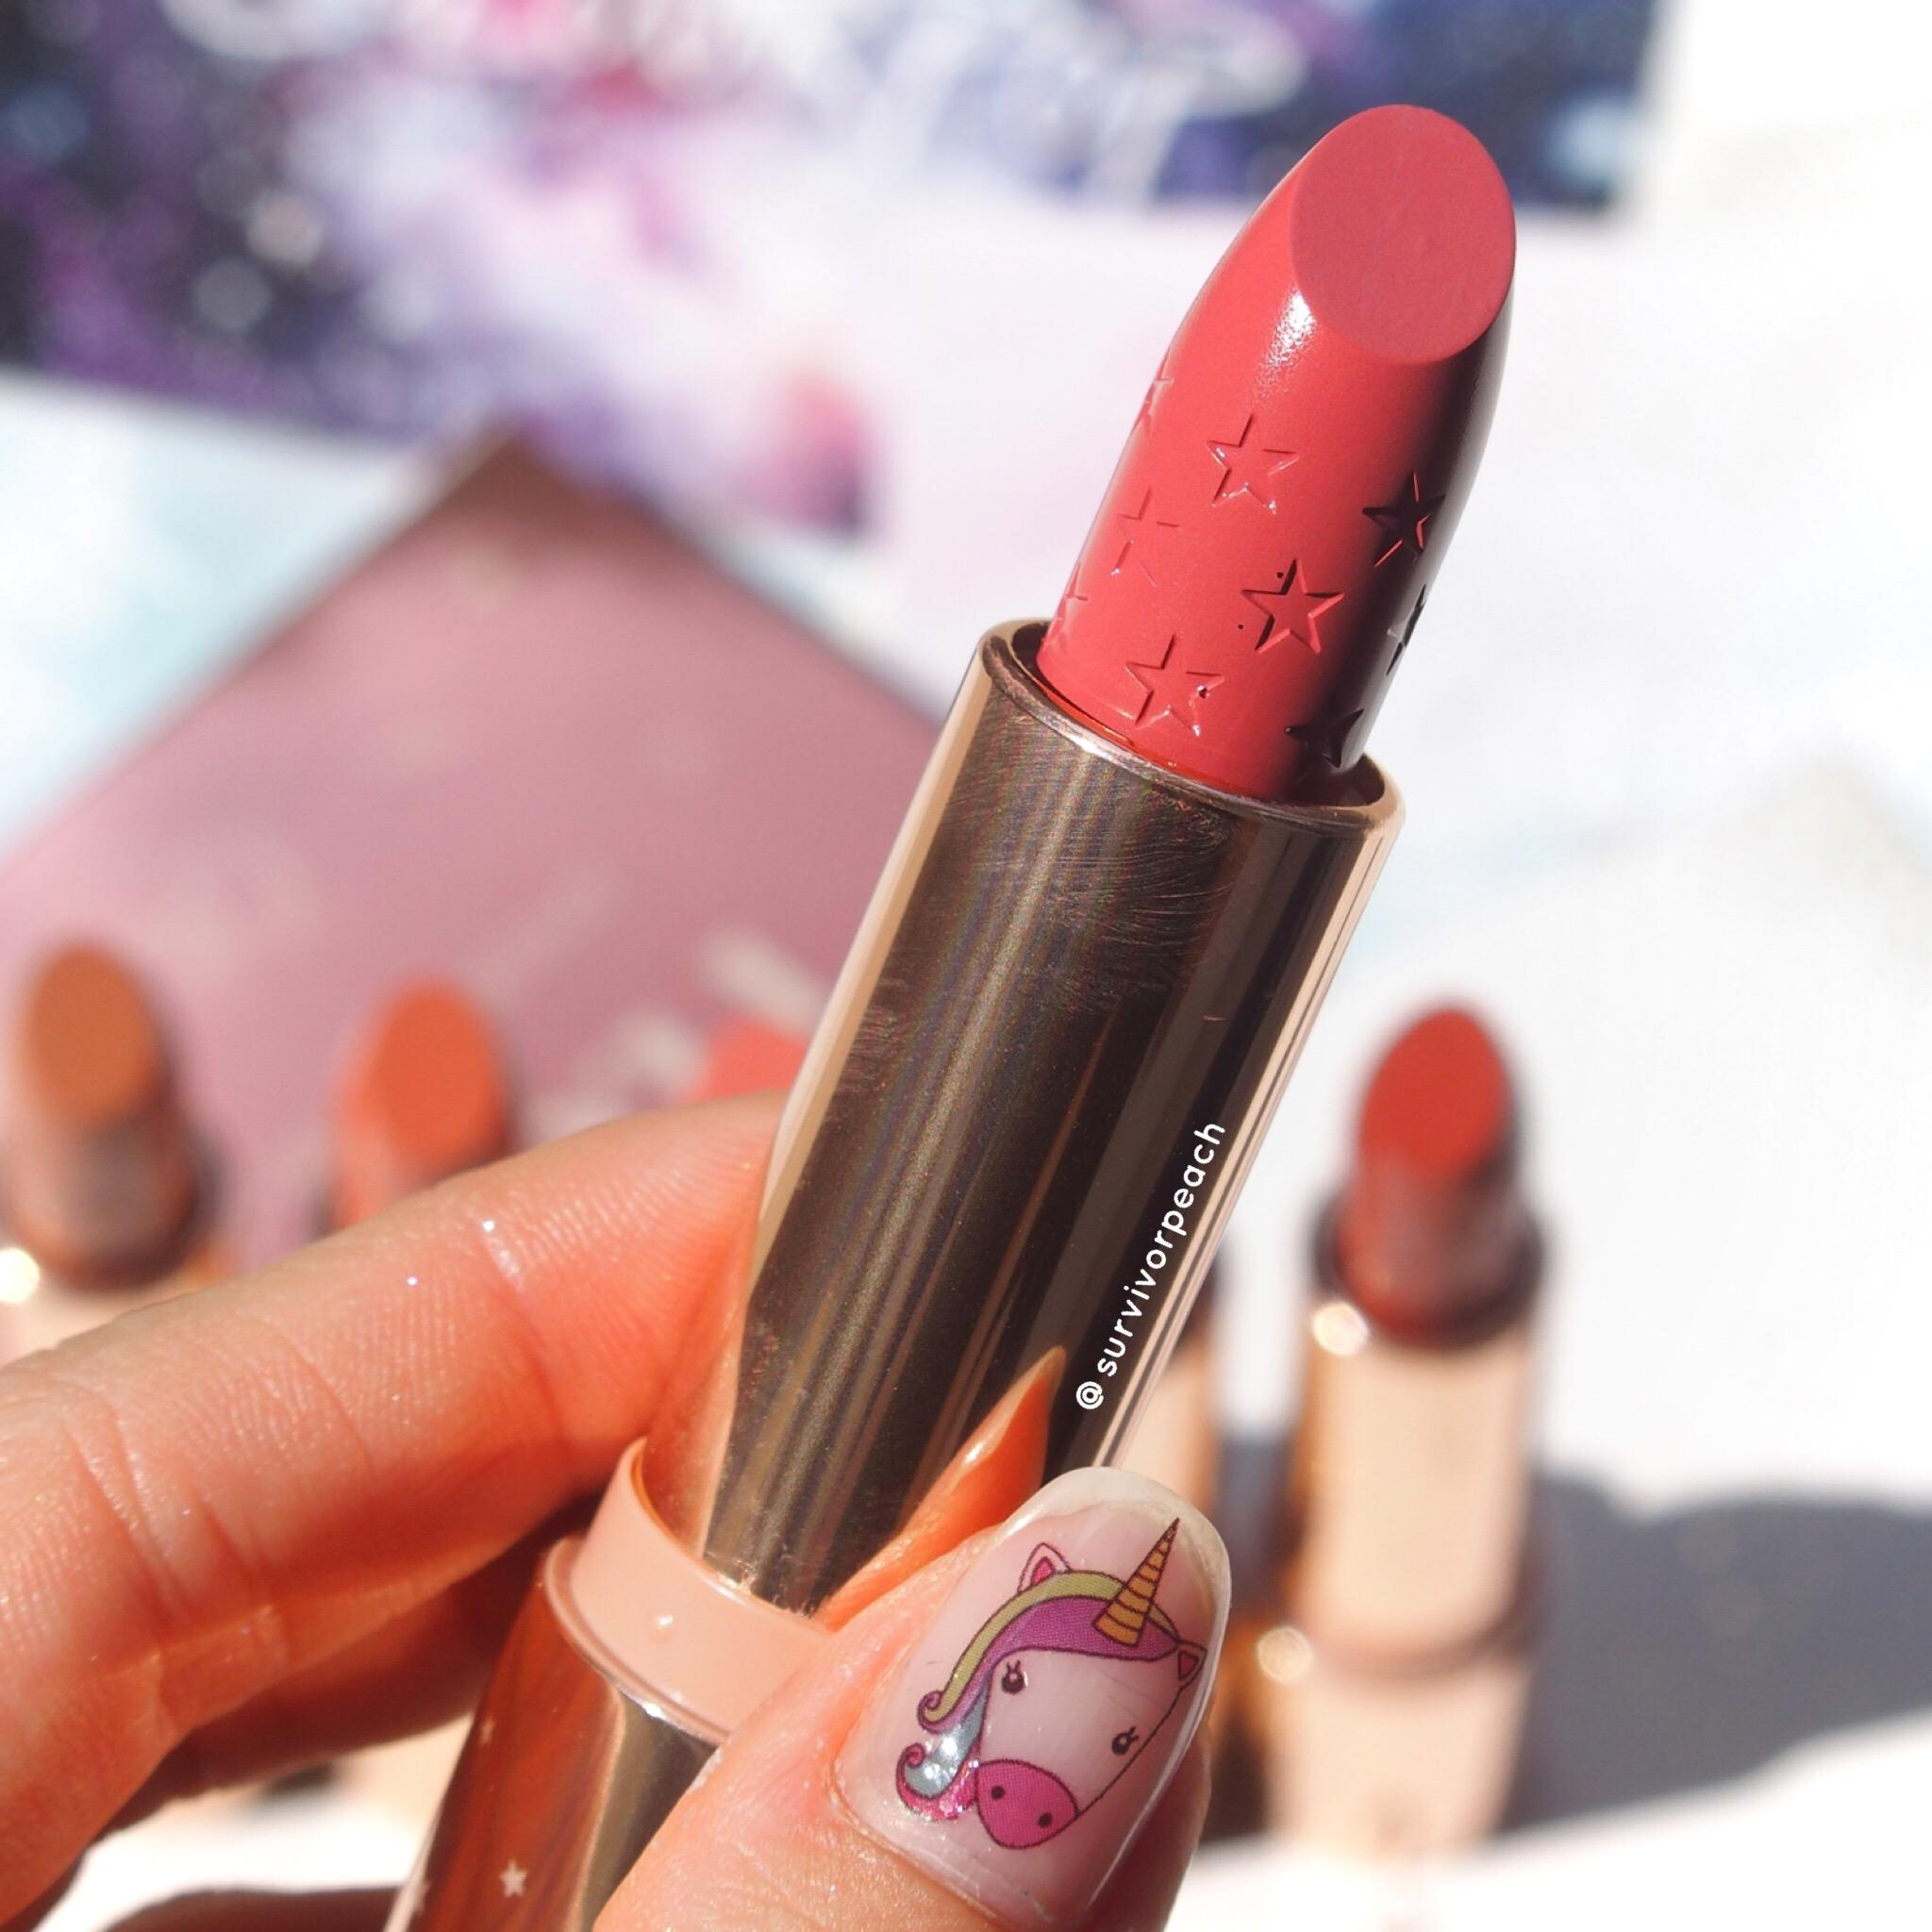 Colourpop Lux Lipstick Money Side Up